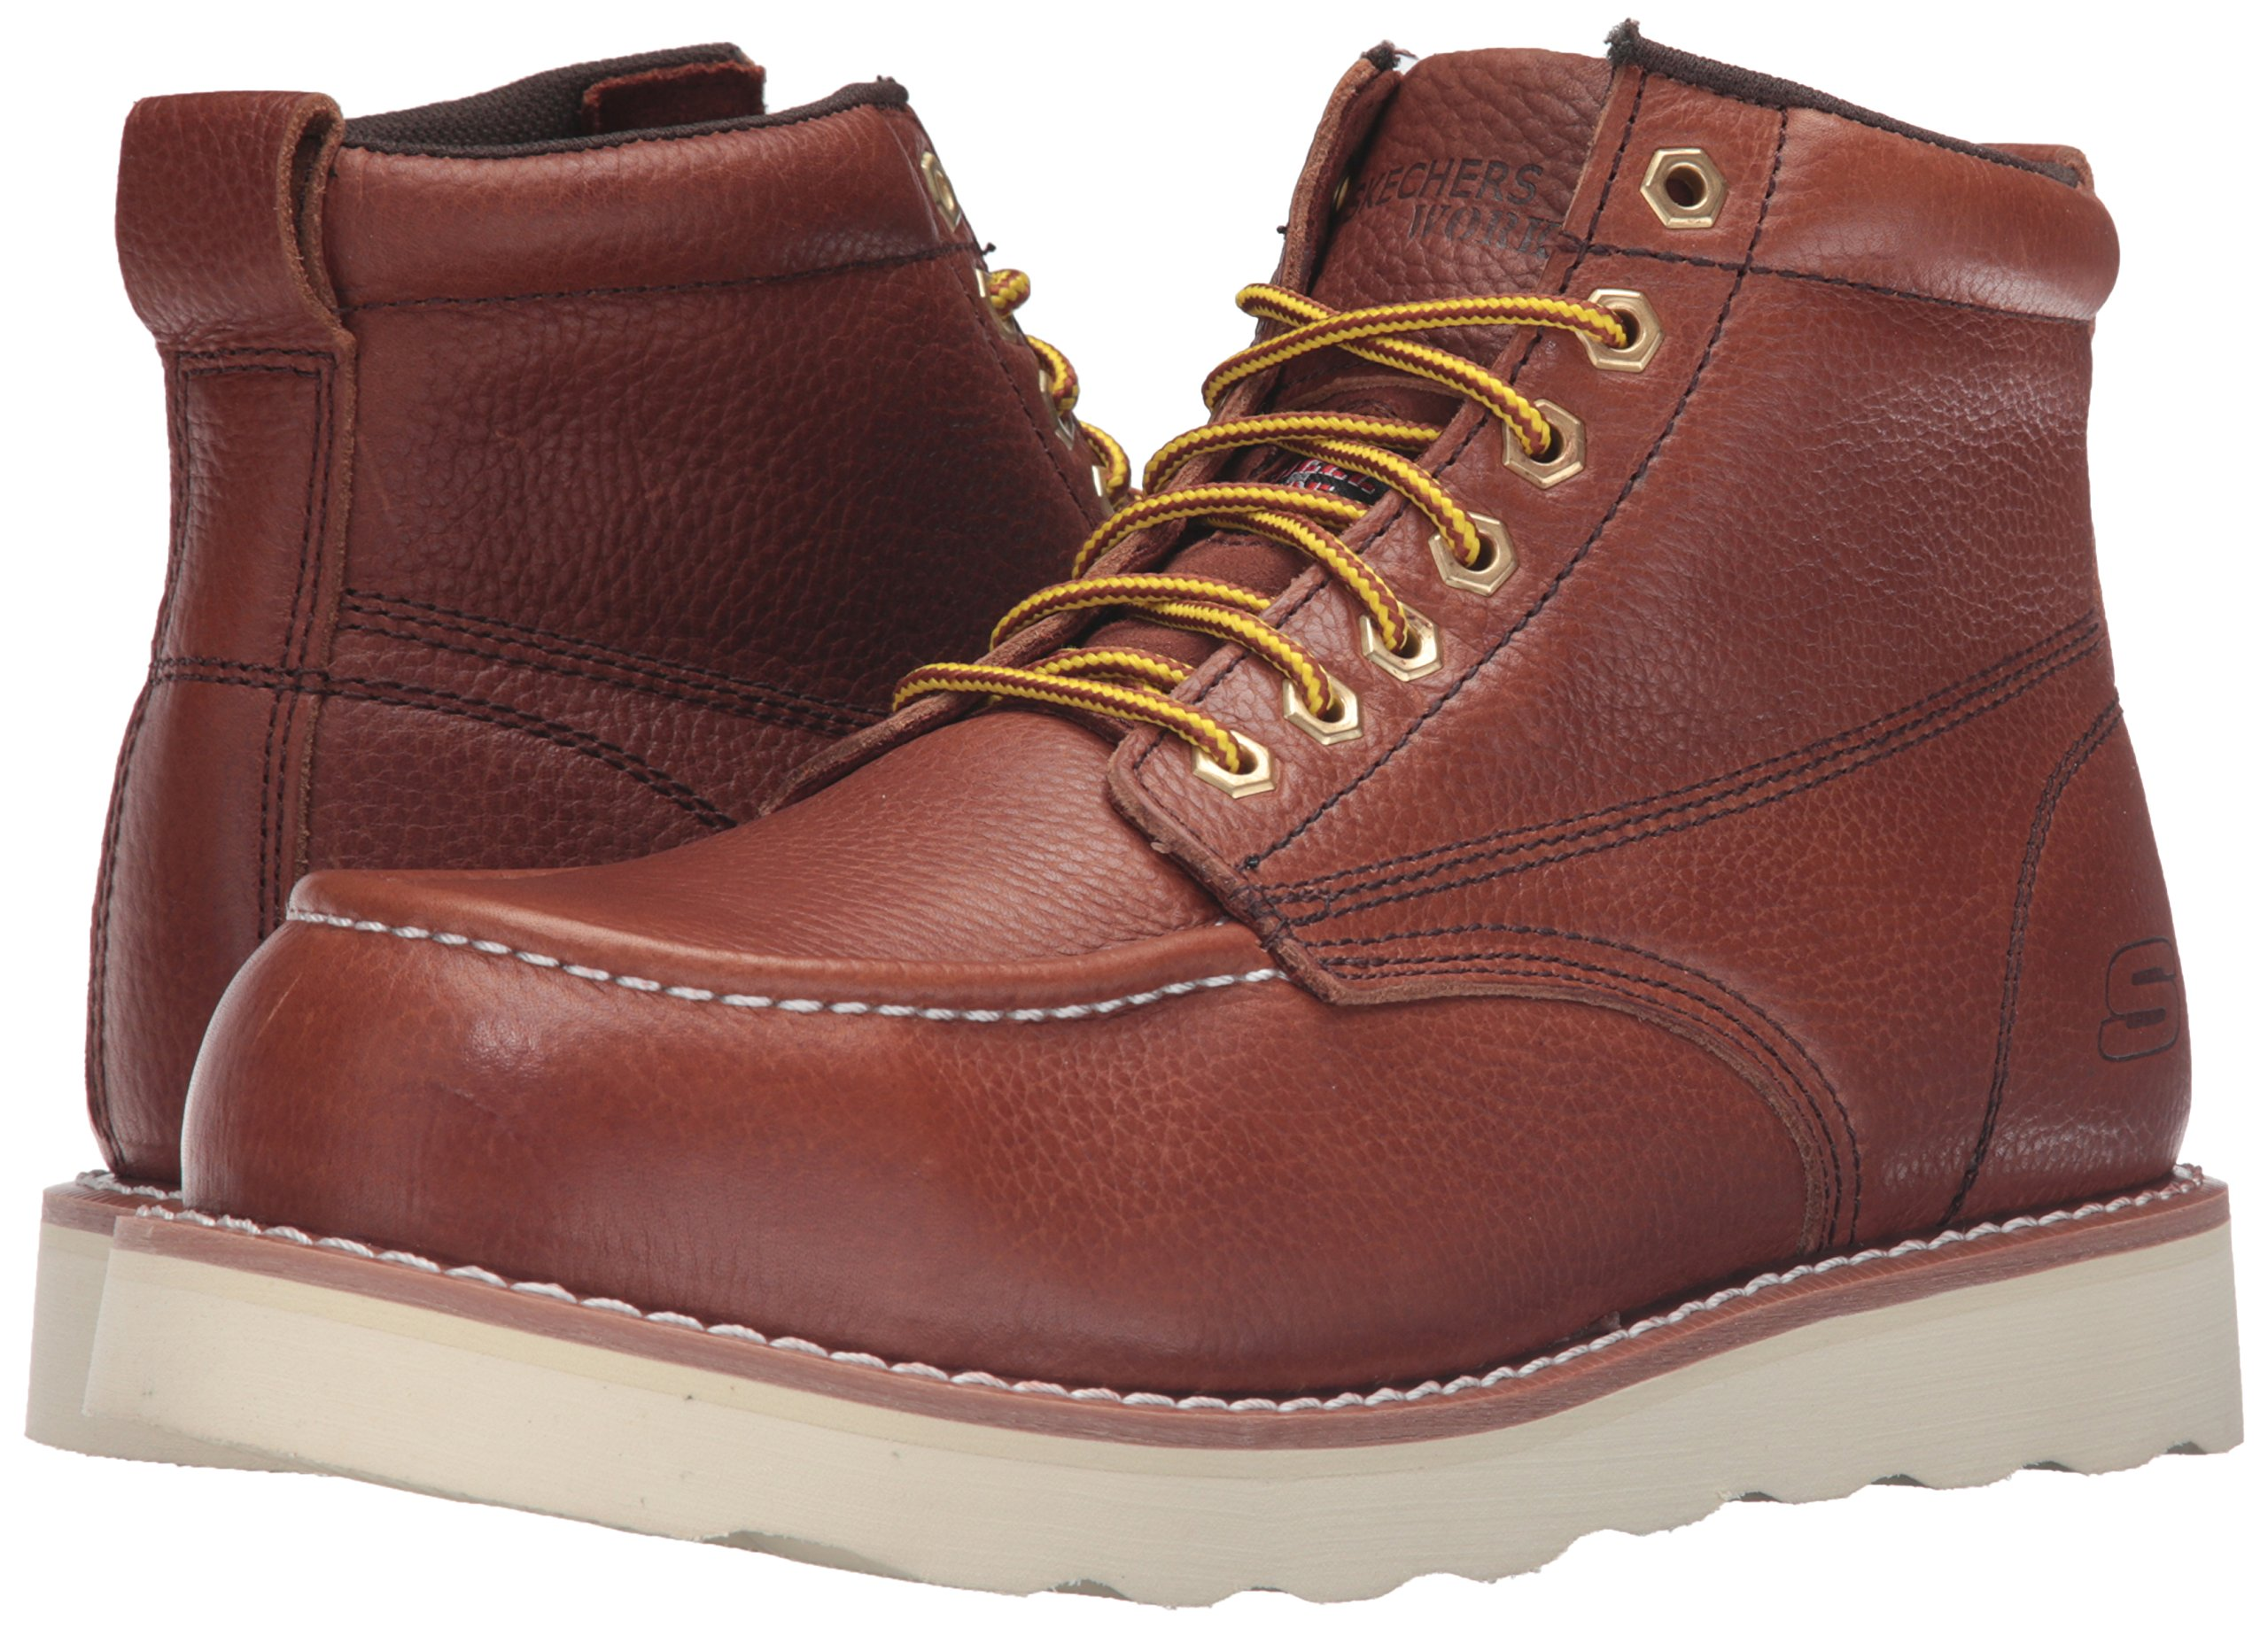 Skechers for Work Men's Pettus Grafford Work Boot,Red Brown,10.5 M US by Skechers (Image #6)